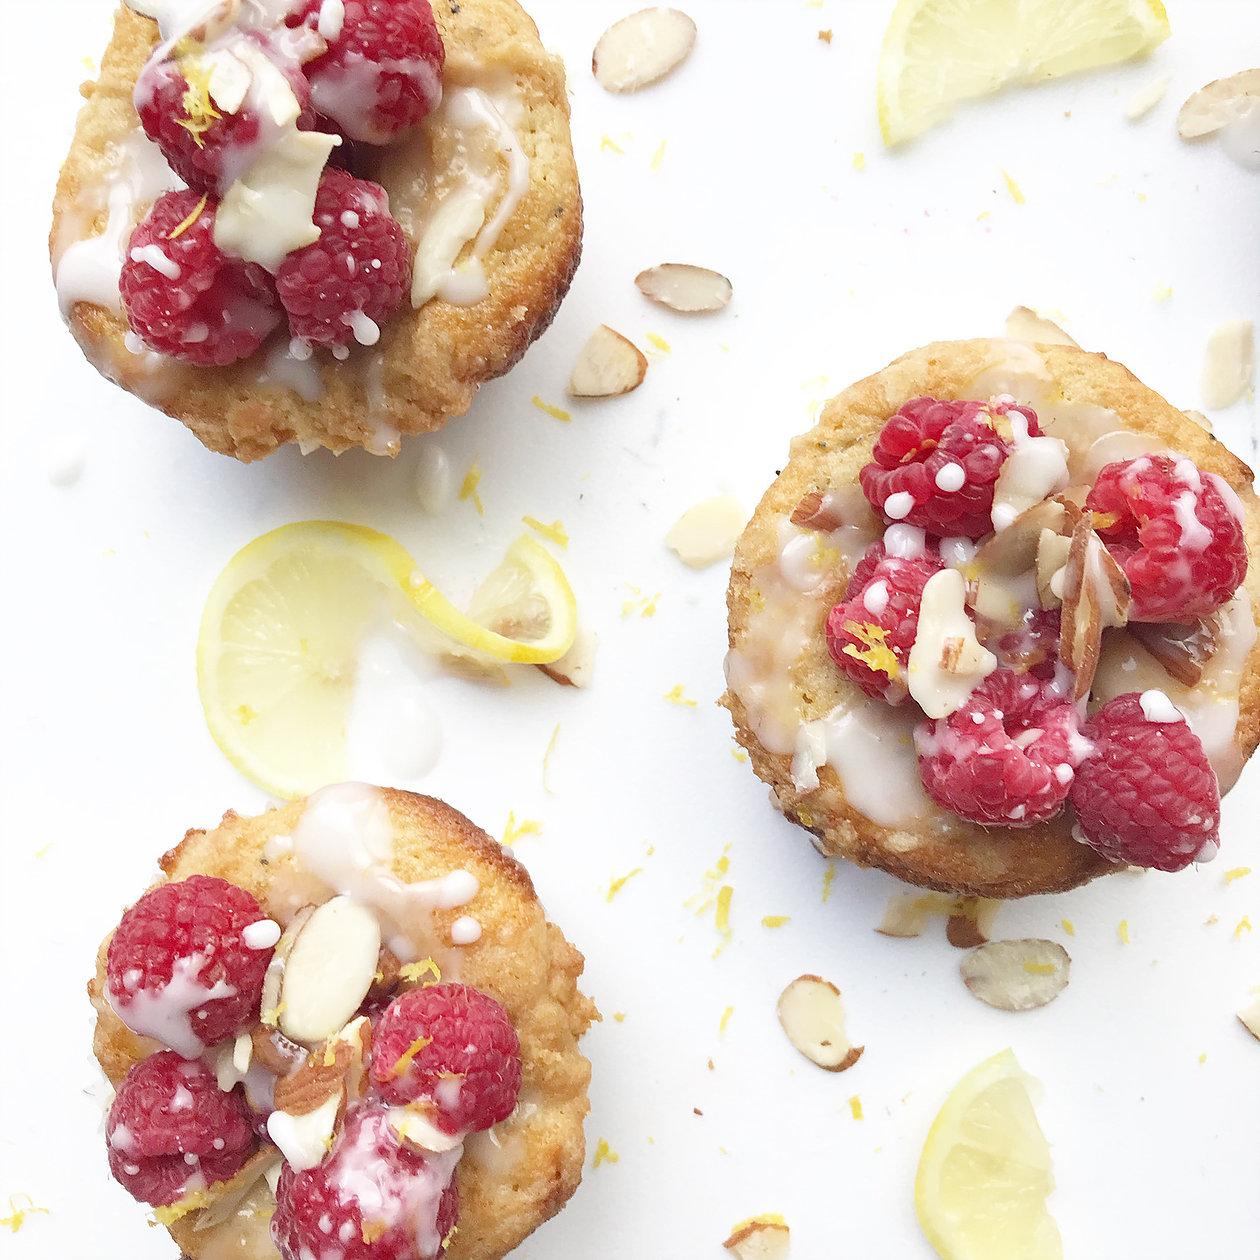 Lemon poppyseed muffins with raspberry